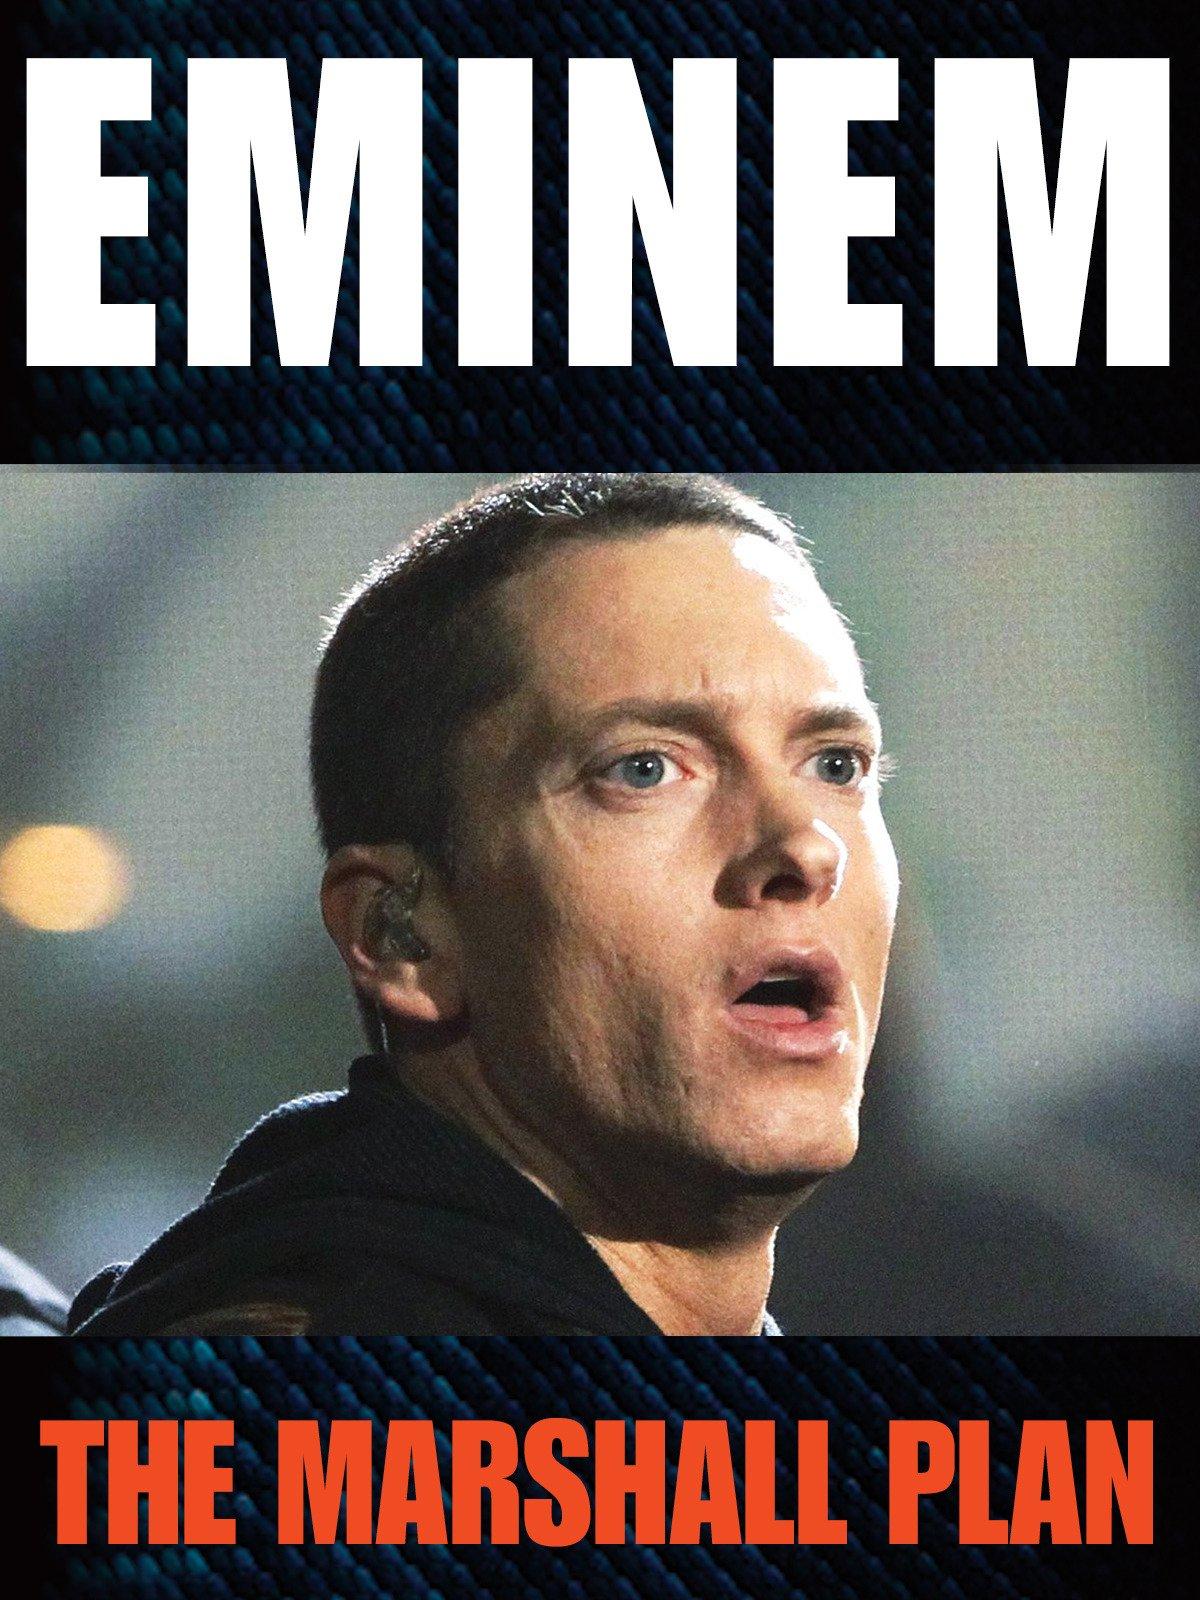 Eminem - The Marshall Plan on Amazon Prime Video UK